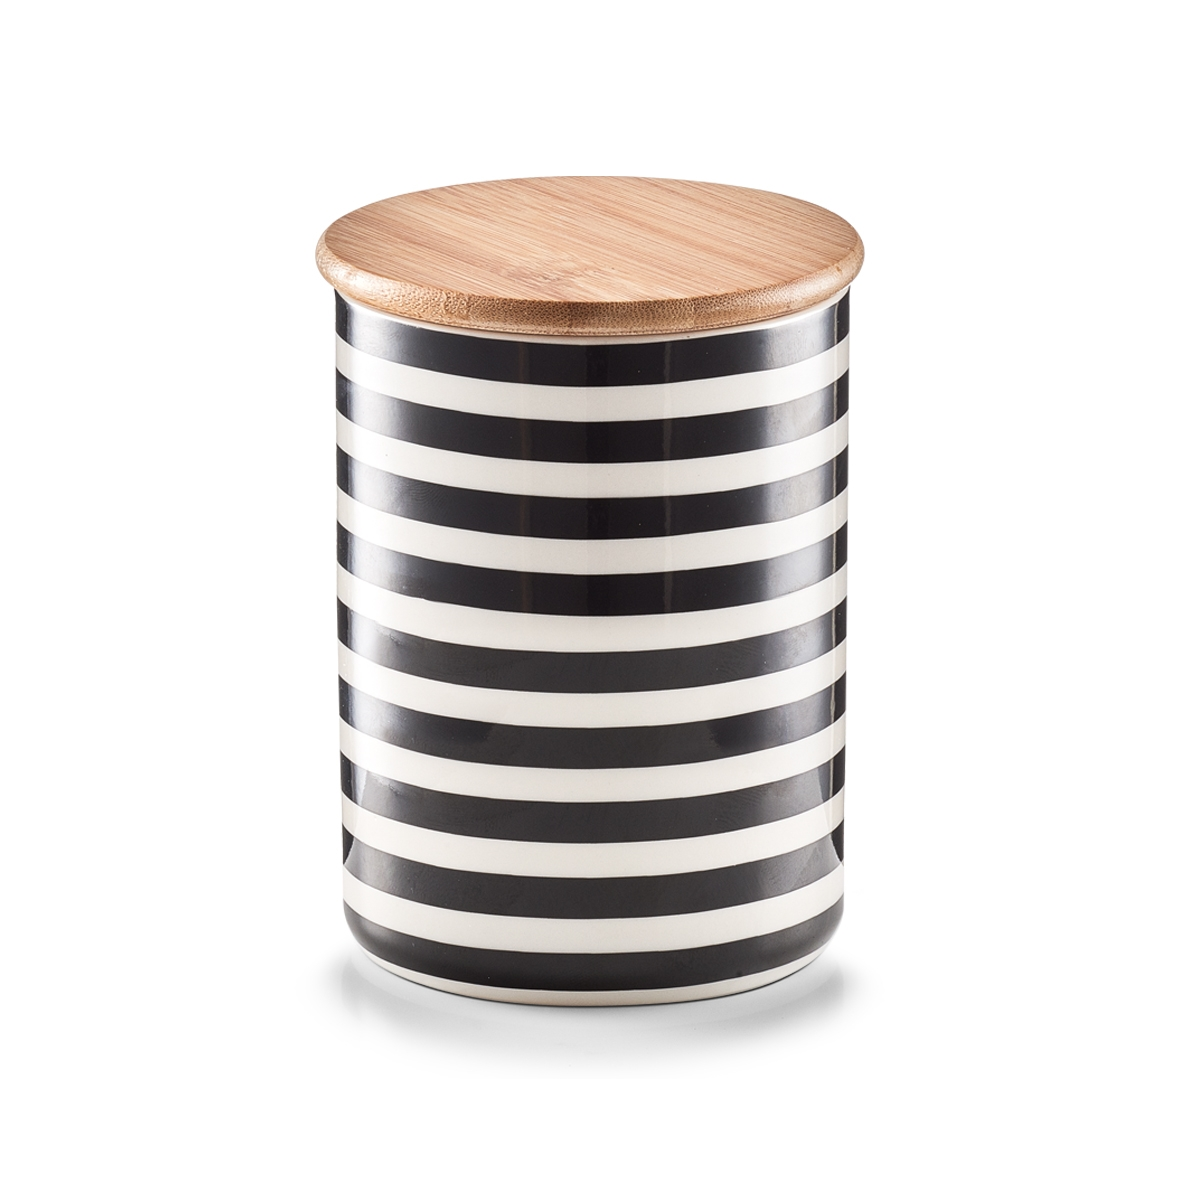 Recipient ceramic pentru depozitare Stripes, capac din bambus, Black/White, 580 ml, Ø 10xH13 cm imagine